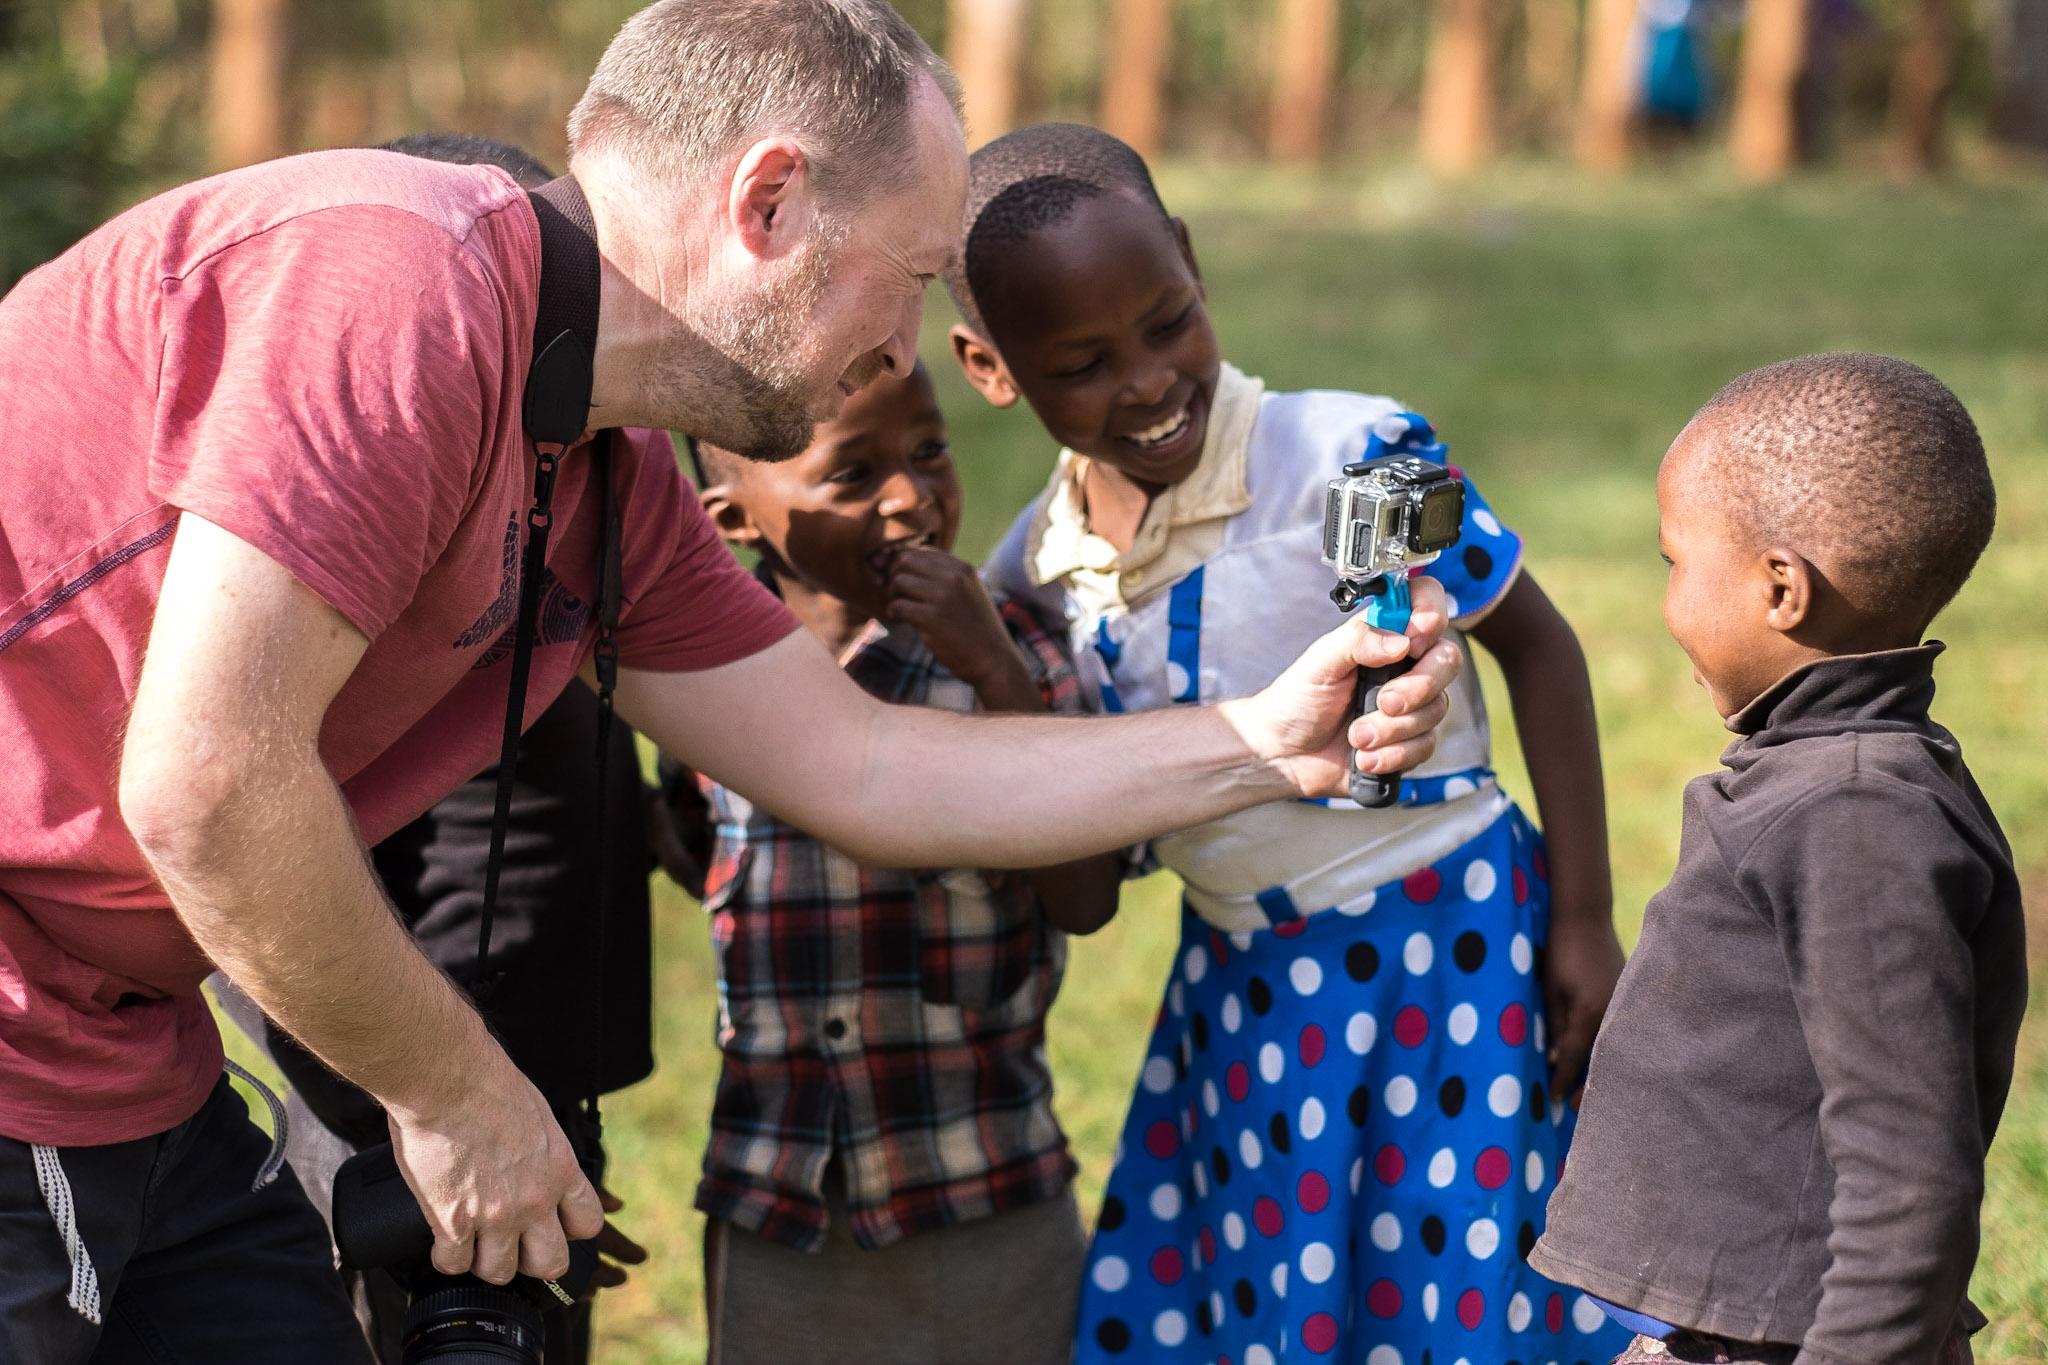 Adam Dickens Photography 2015 - Five Talents UK, Kenya - Me 1.jpg